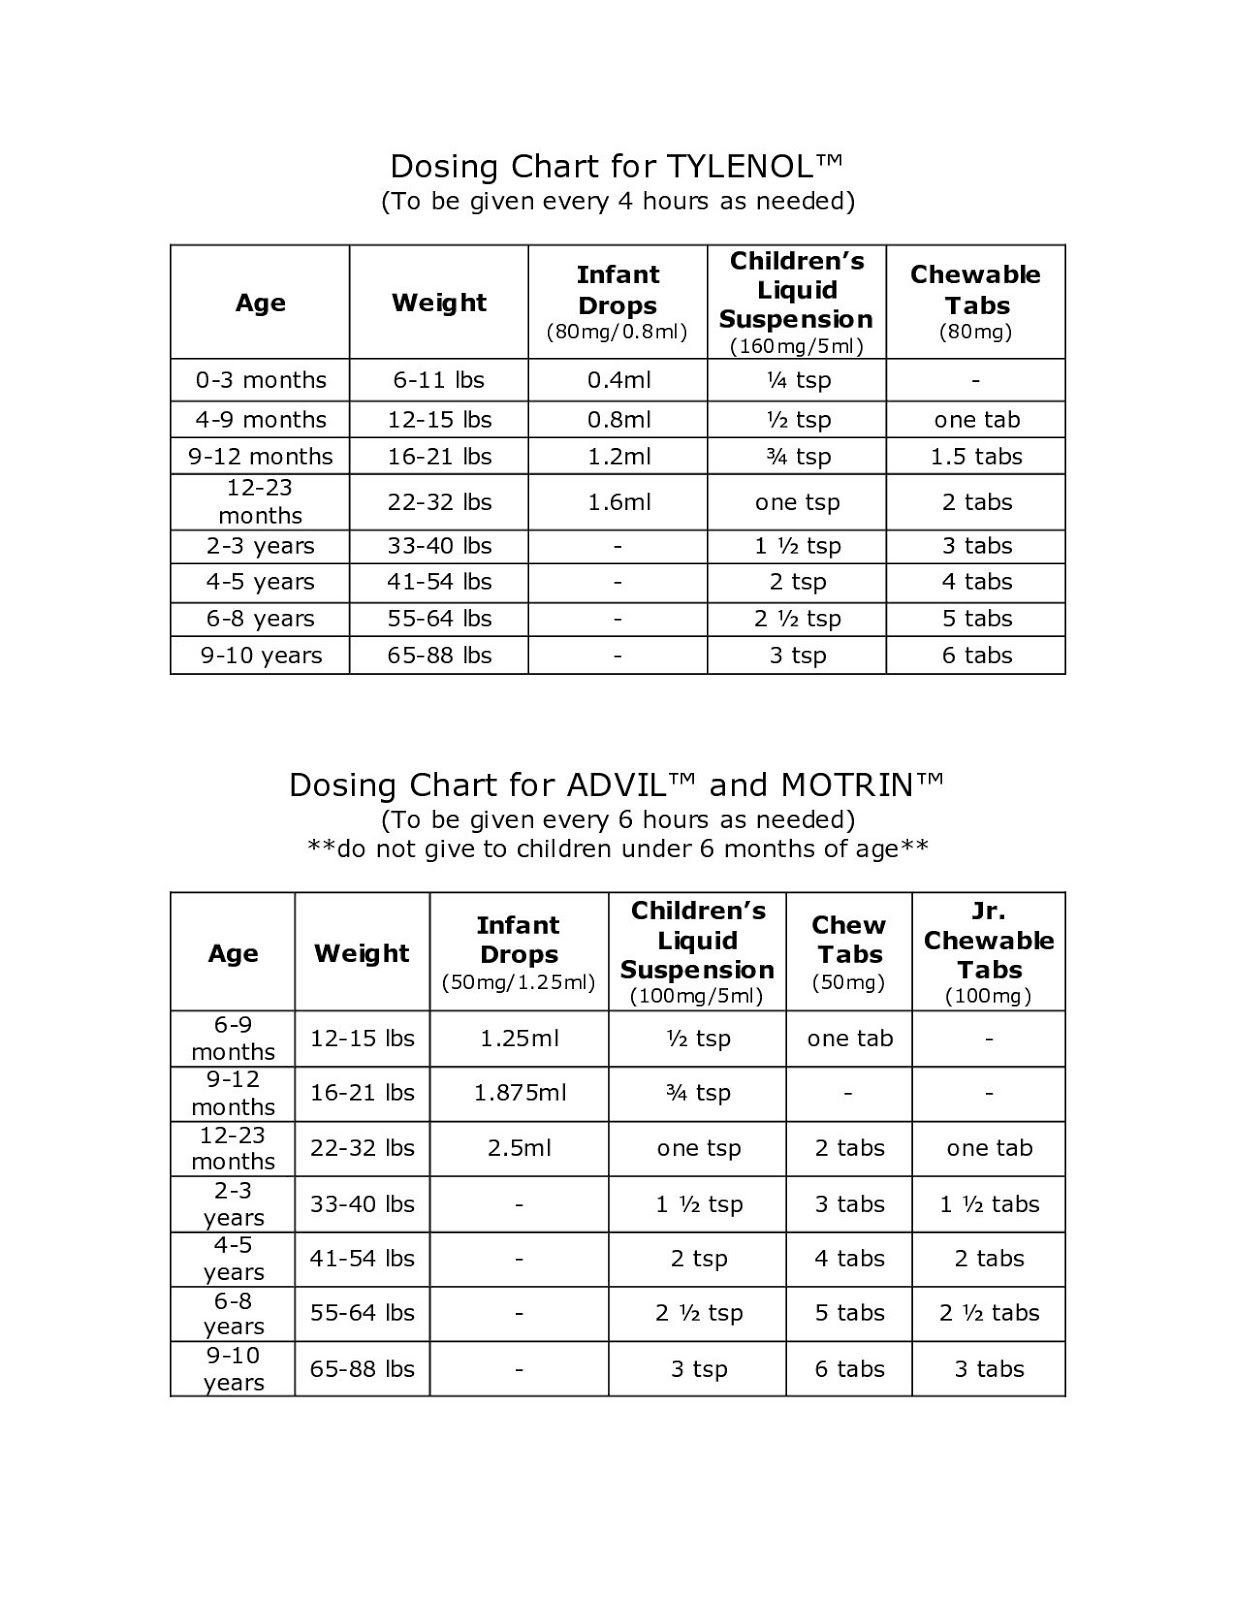 Mommy vs nurse dosing chart for tylenol motrin nurse dosing chart for tylenol motrin nvjuhfo Images